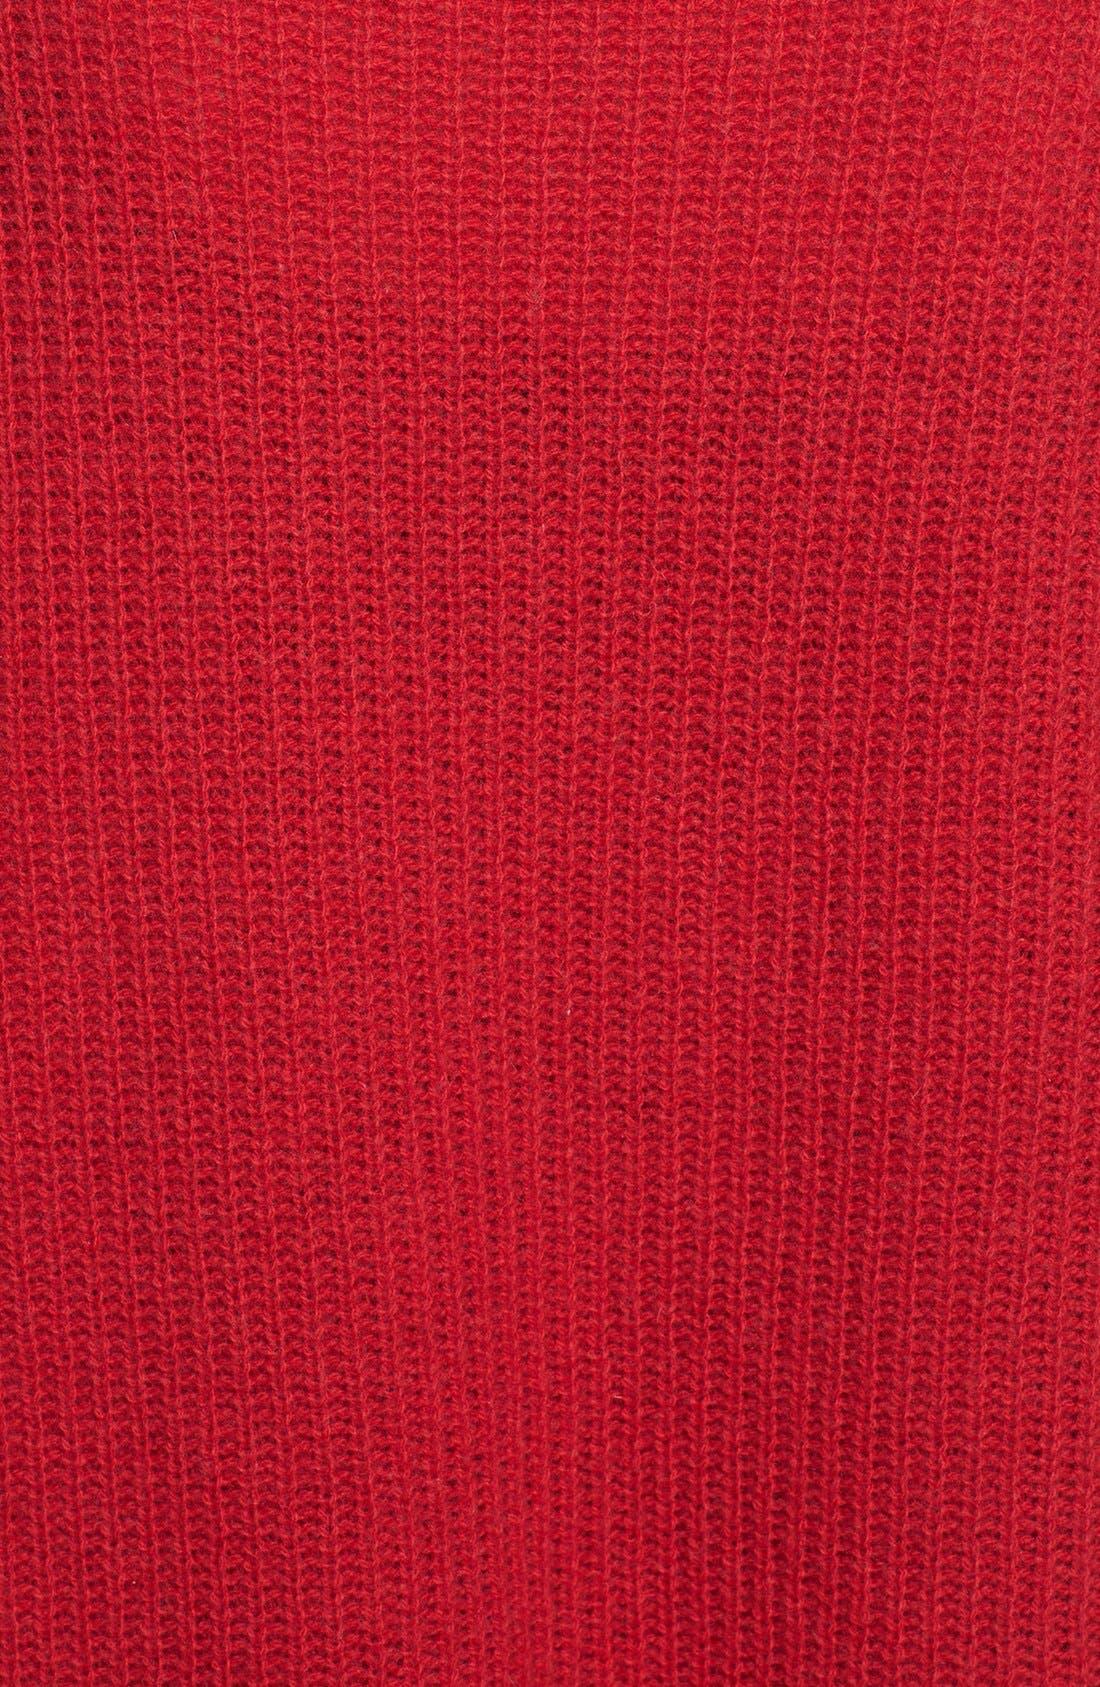 Alternate Image 3  - Eileen Fisher Merino & Yak Wool Turtleneck Sweater